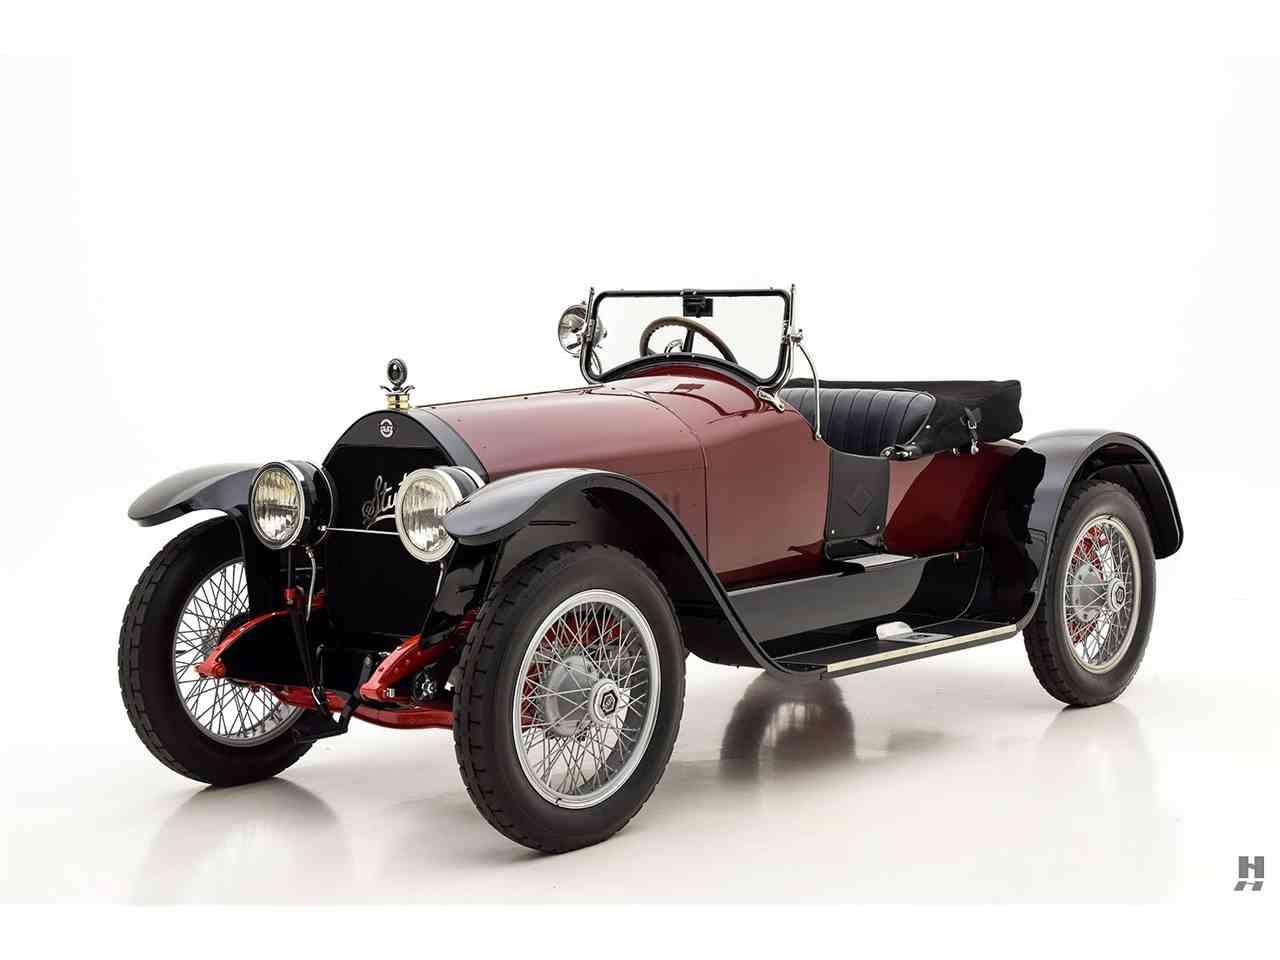 1920 Stutz Bearcat for Sale - CC-986645